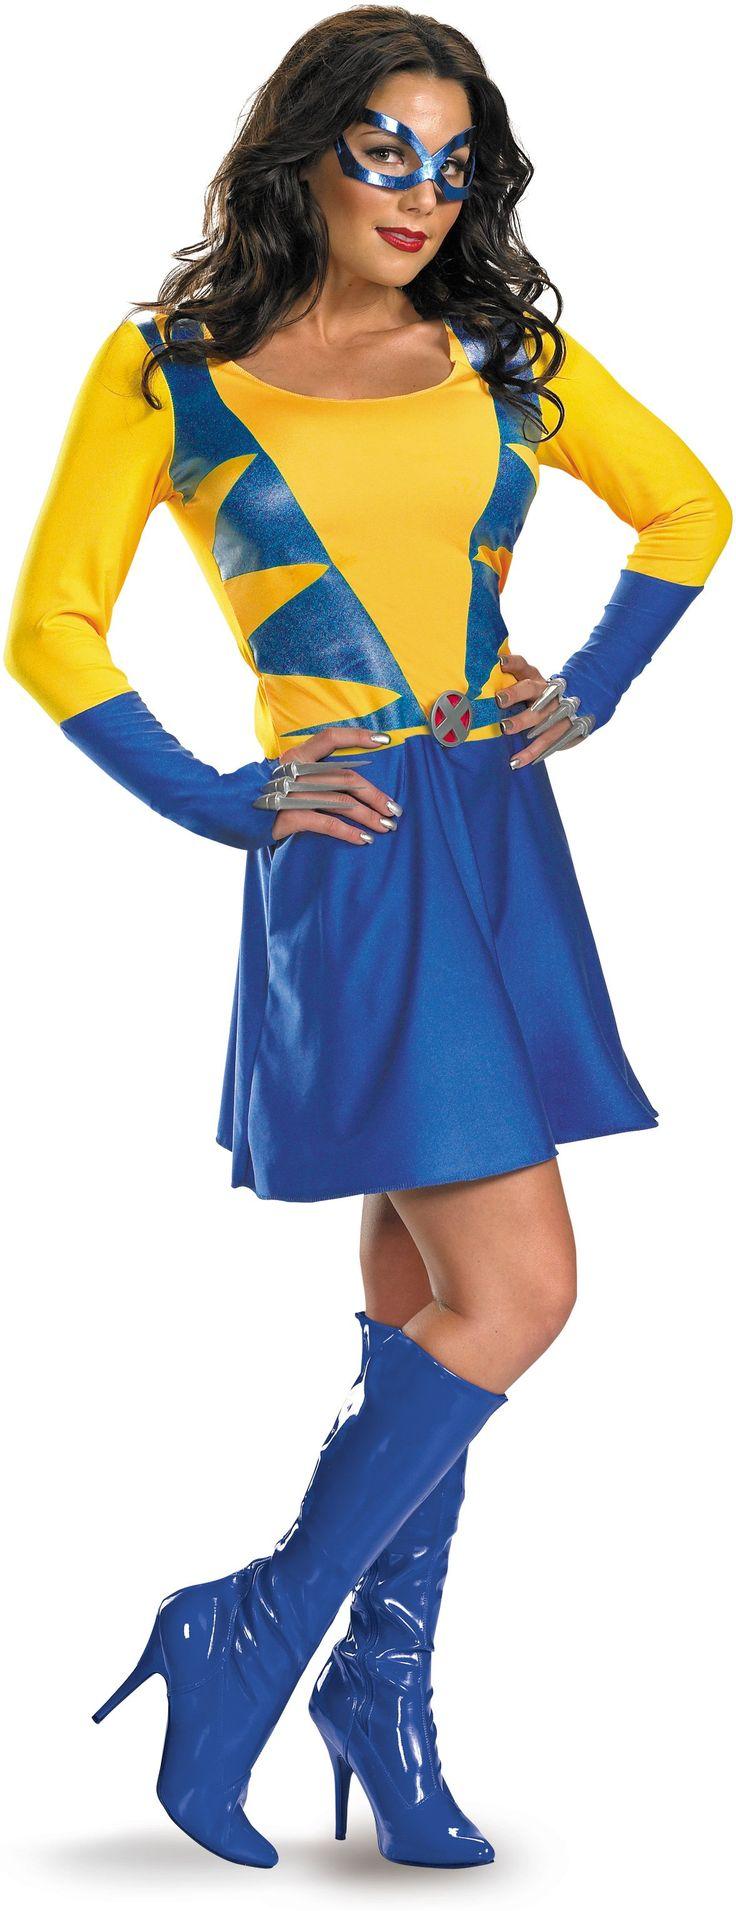 The 25+ best Wolverine costume ideas on Pinterest | Wolverine age ...